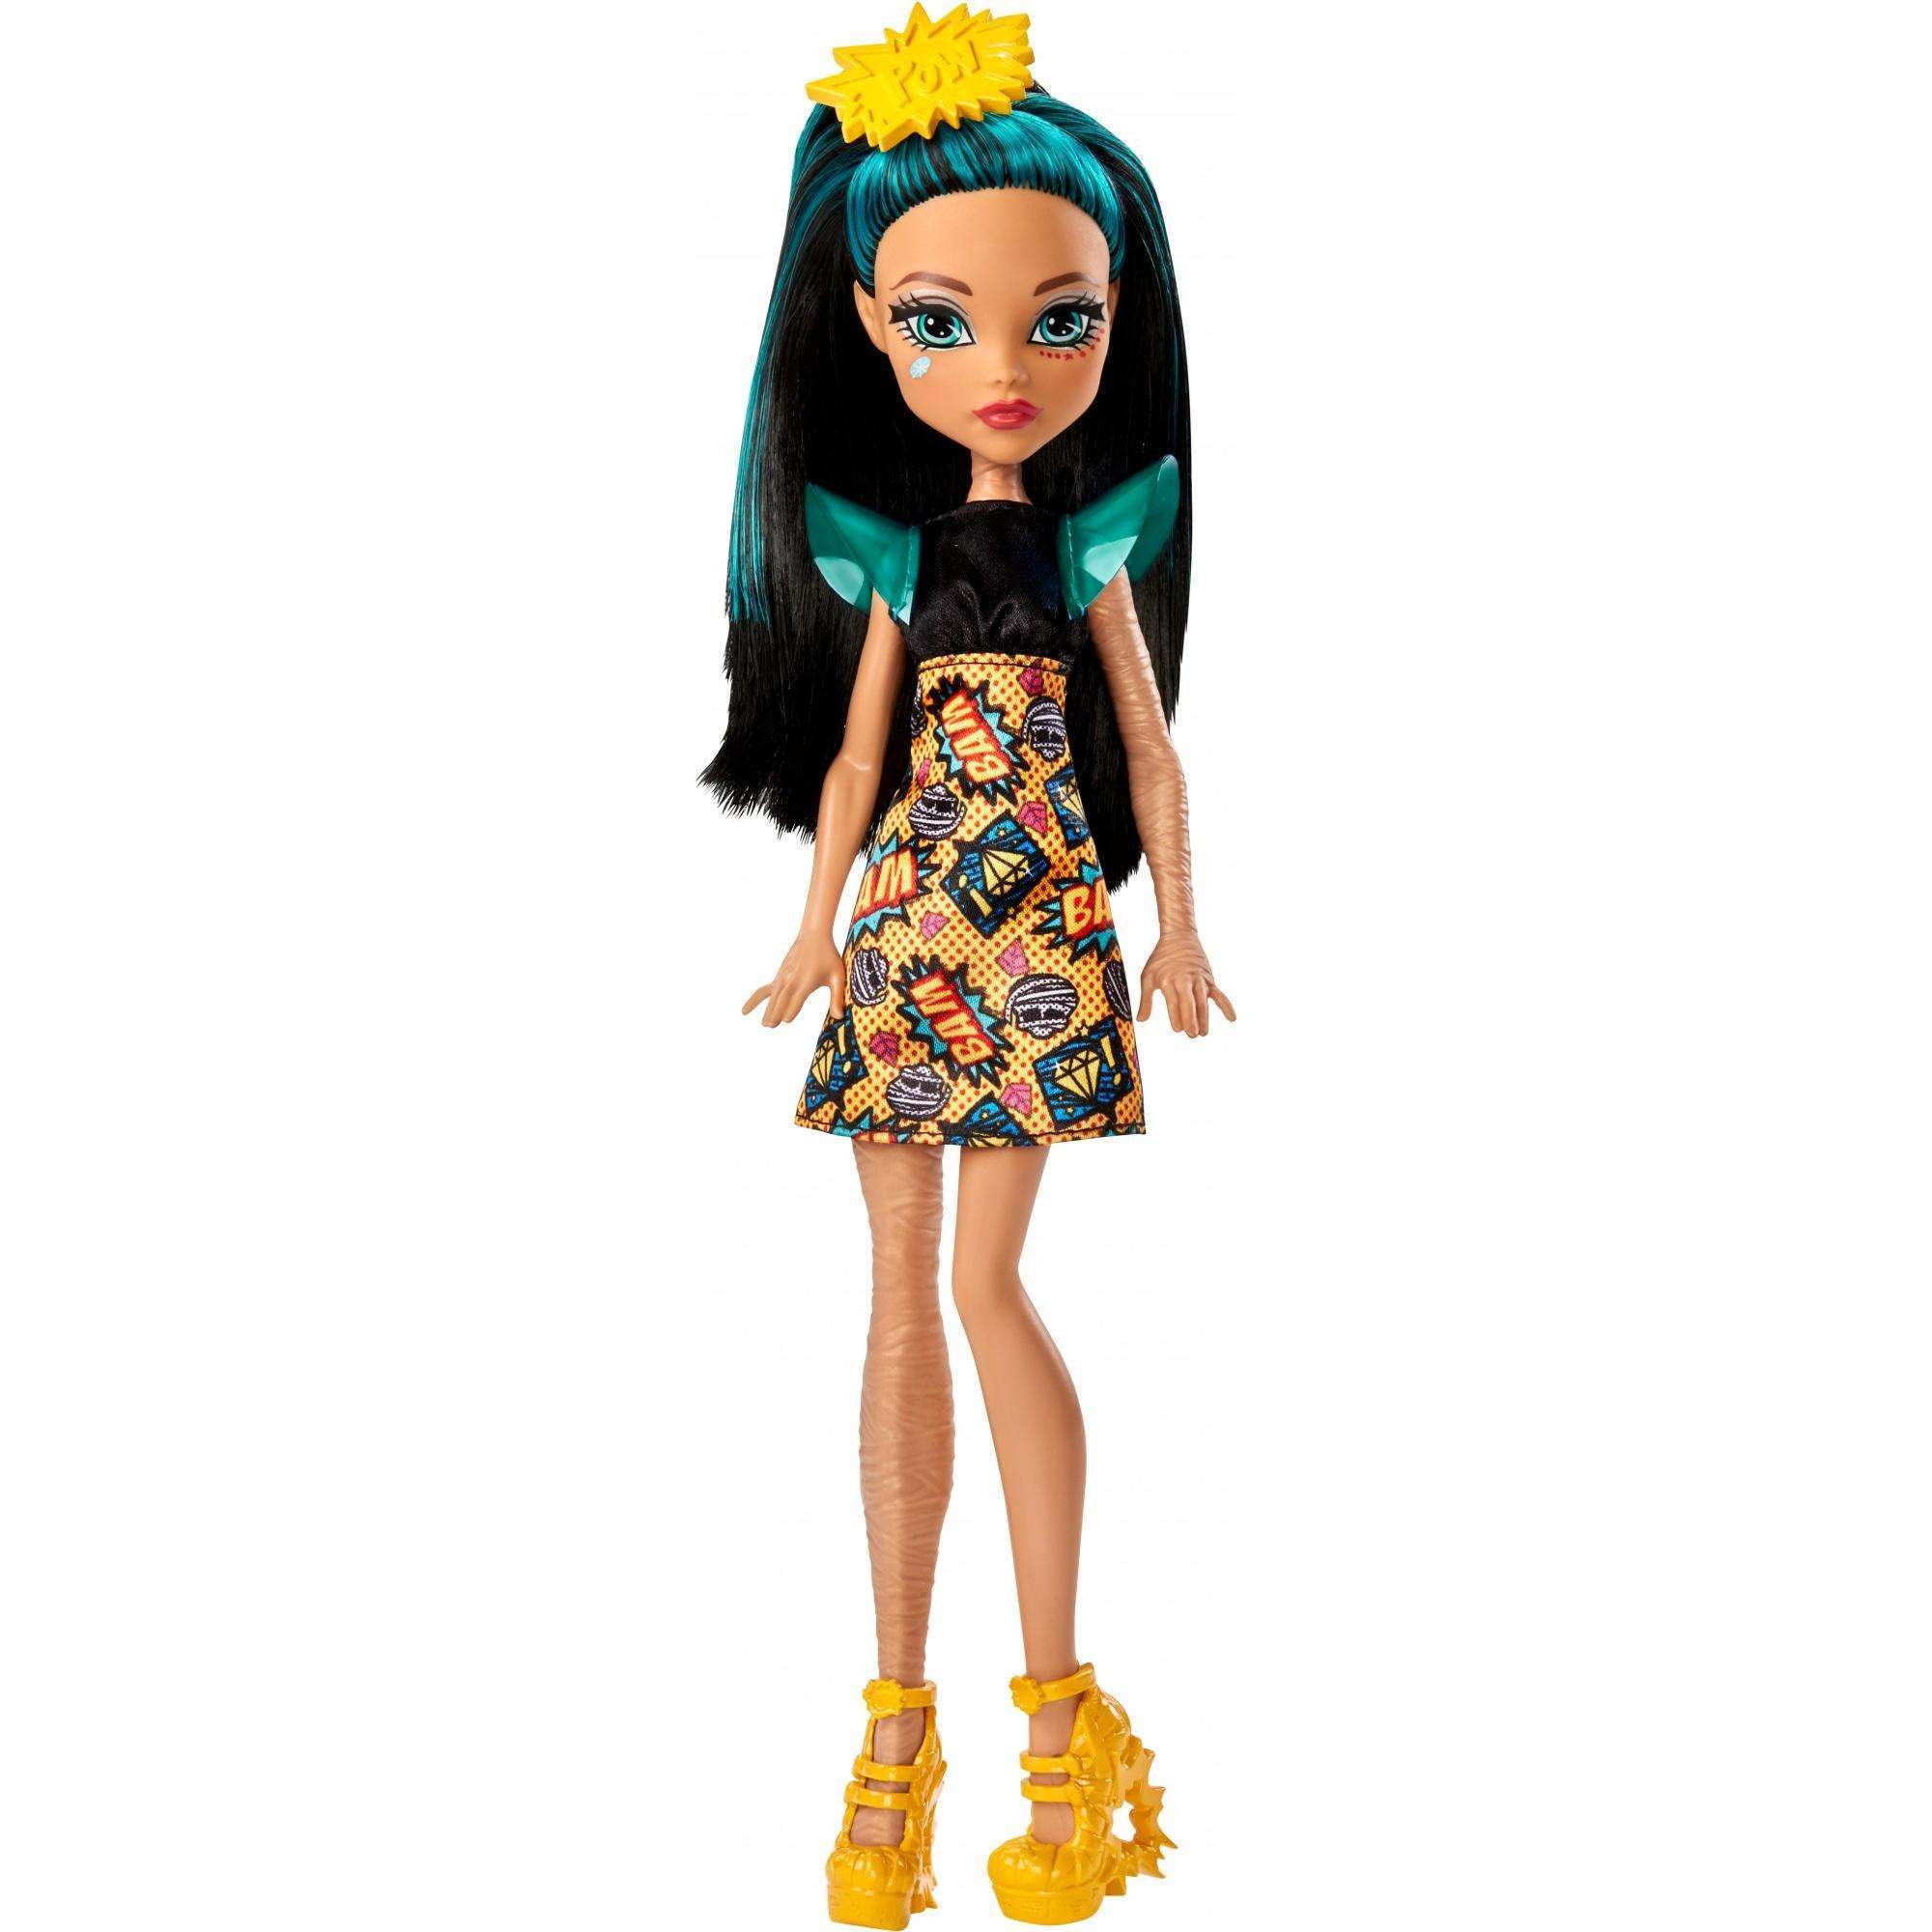 Monster High Cleo De Nile Doll by Mattel